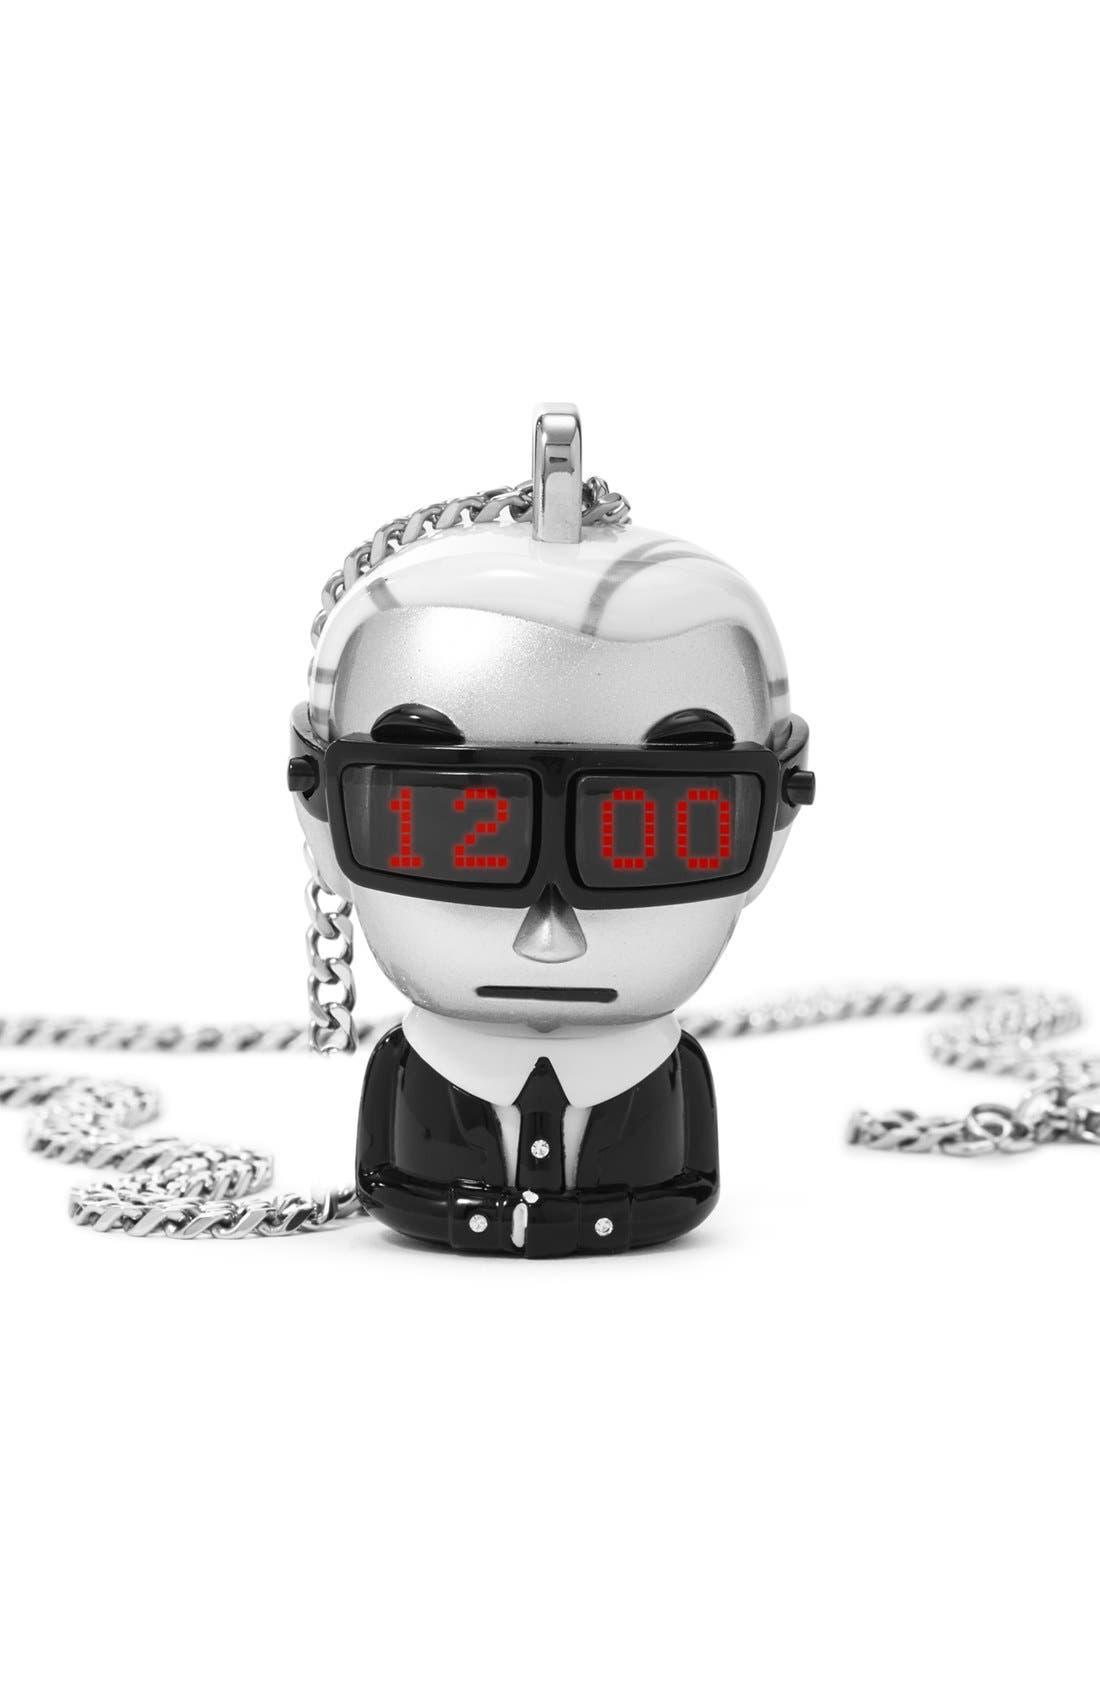 KARL LAGERFELD 'tokidoki' Digital Necklace Watch, 37mm x 51mm,                             Main thumbnail 1, color,                             040